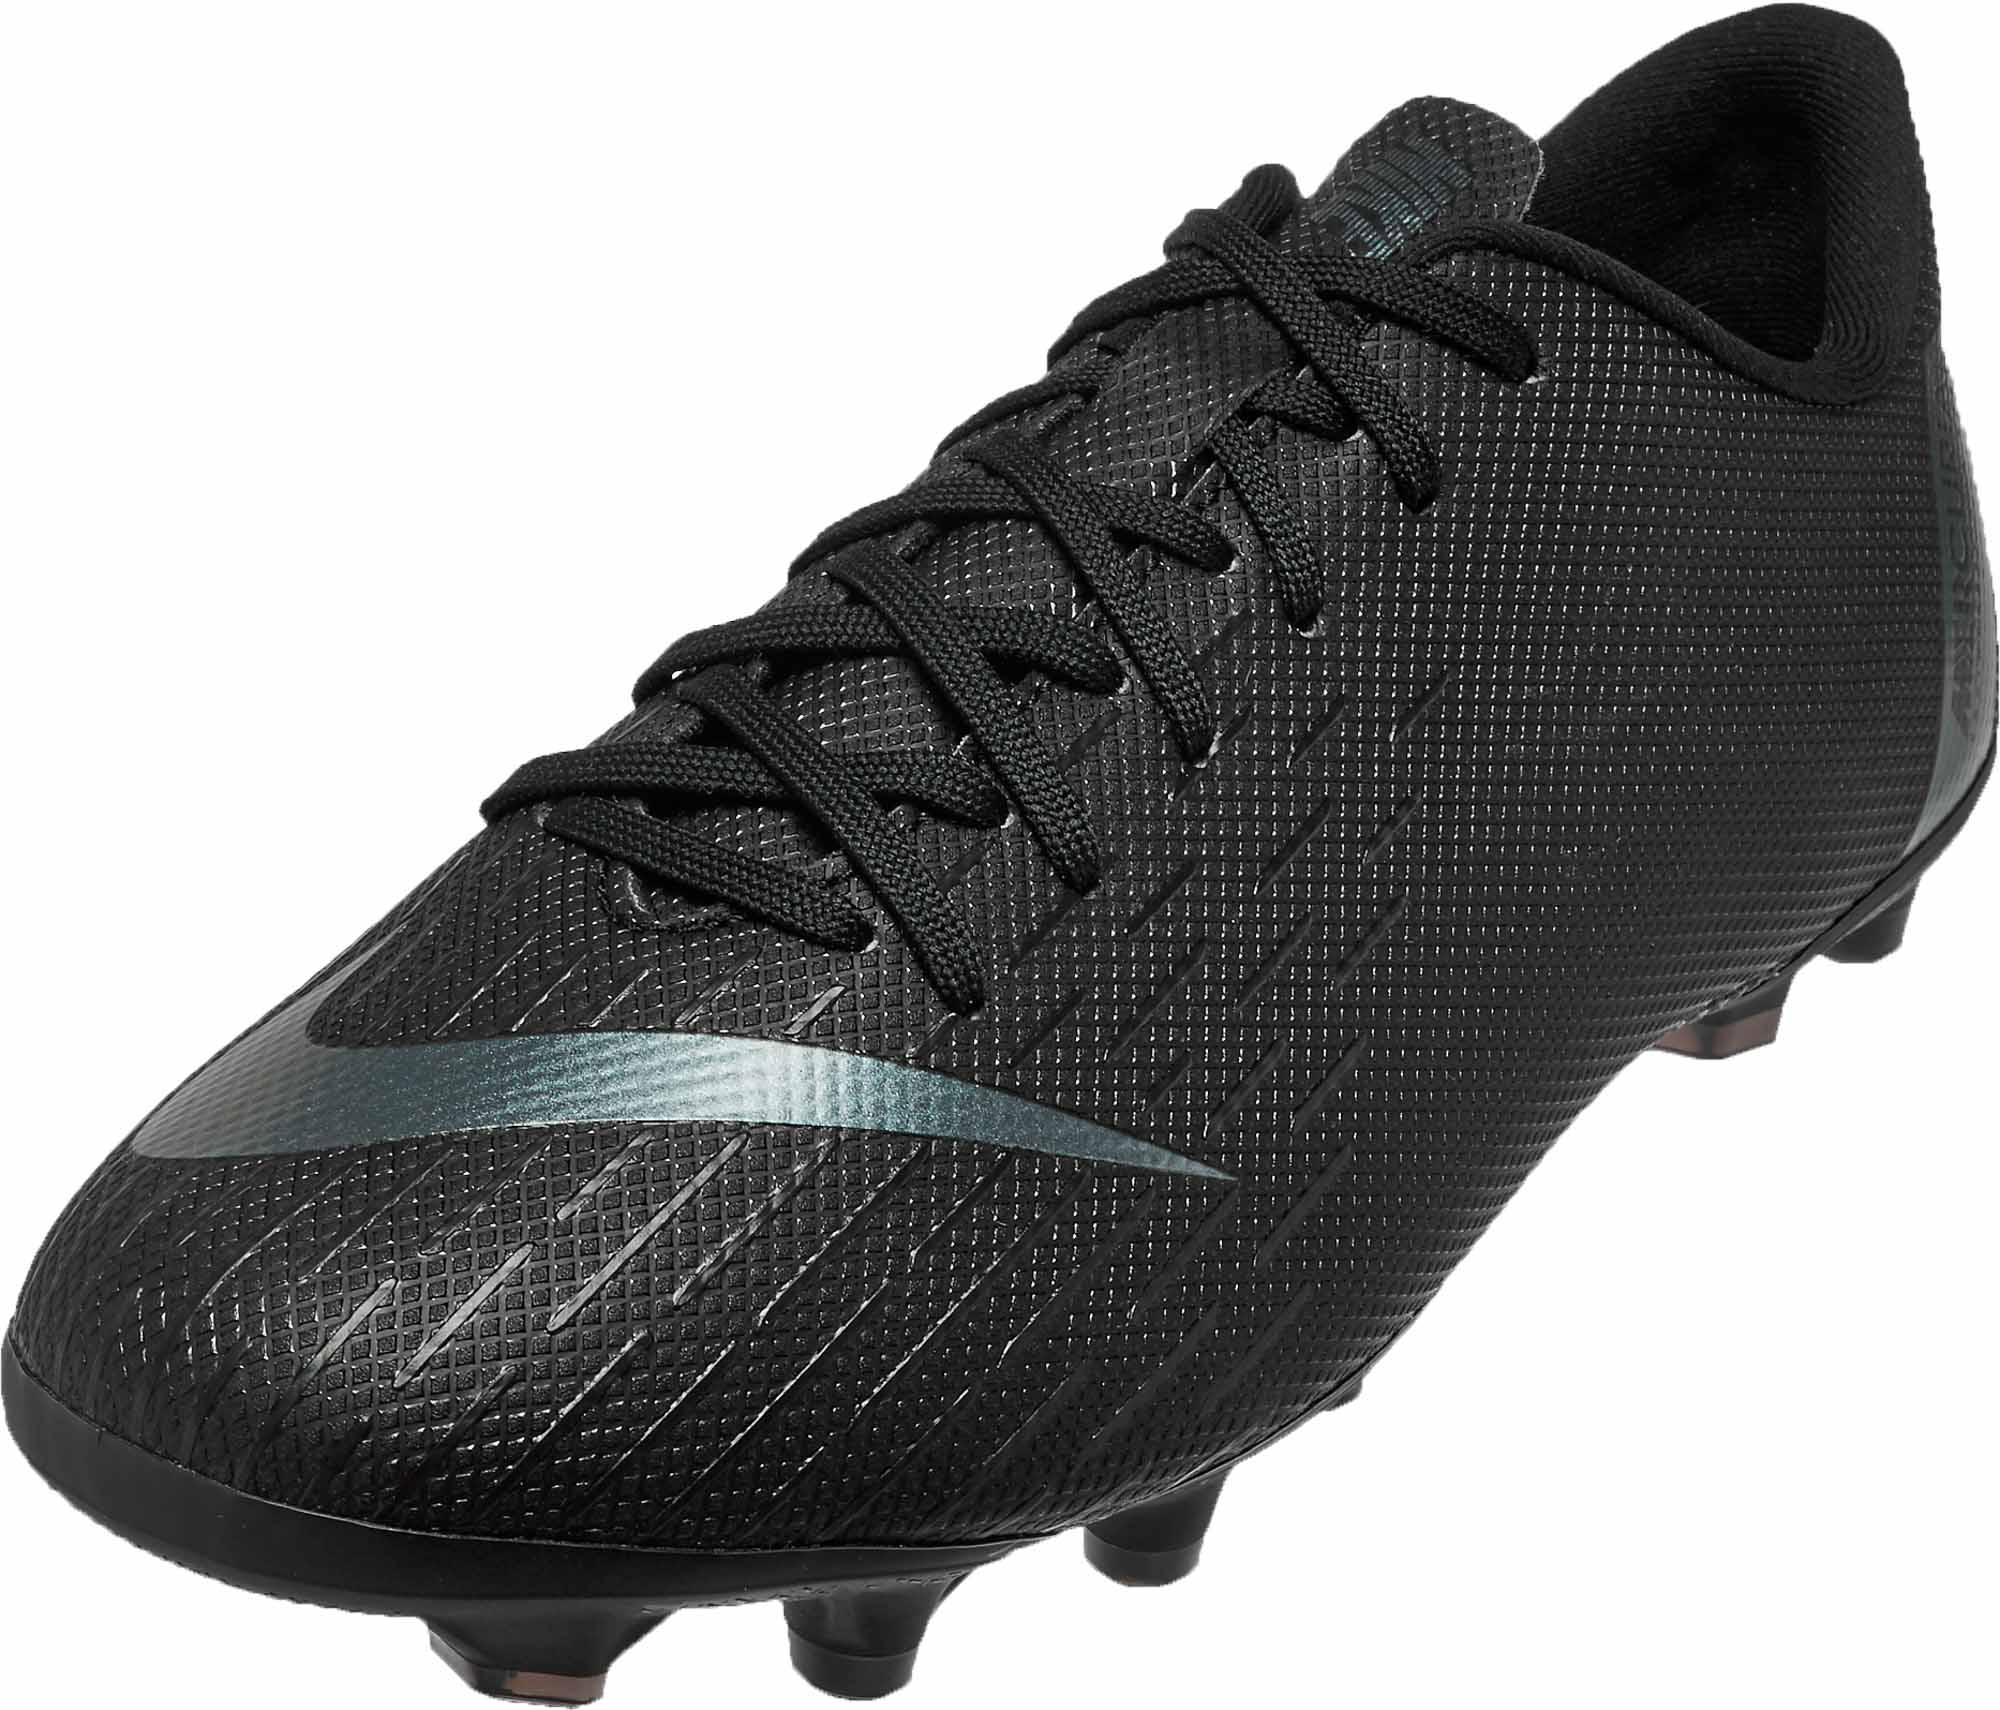 a2222c544da72 Nike Mercurial Vapor 12 Academy MG – Youth – Black/Black